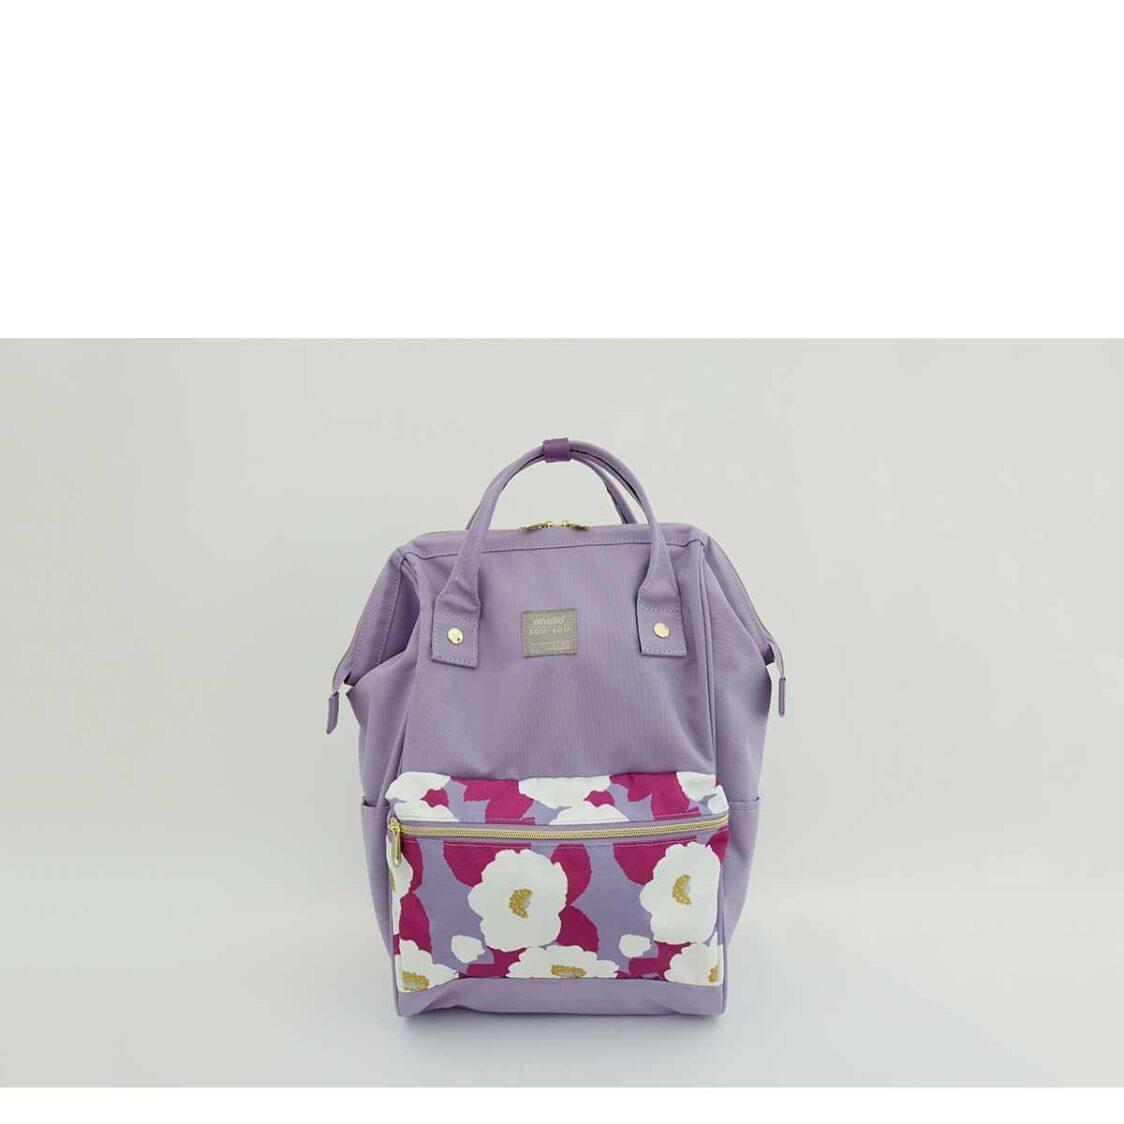 Anello X SousouT BackpackR Lavender